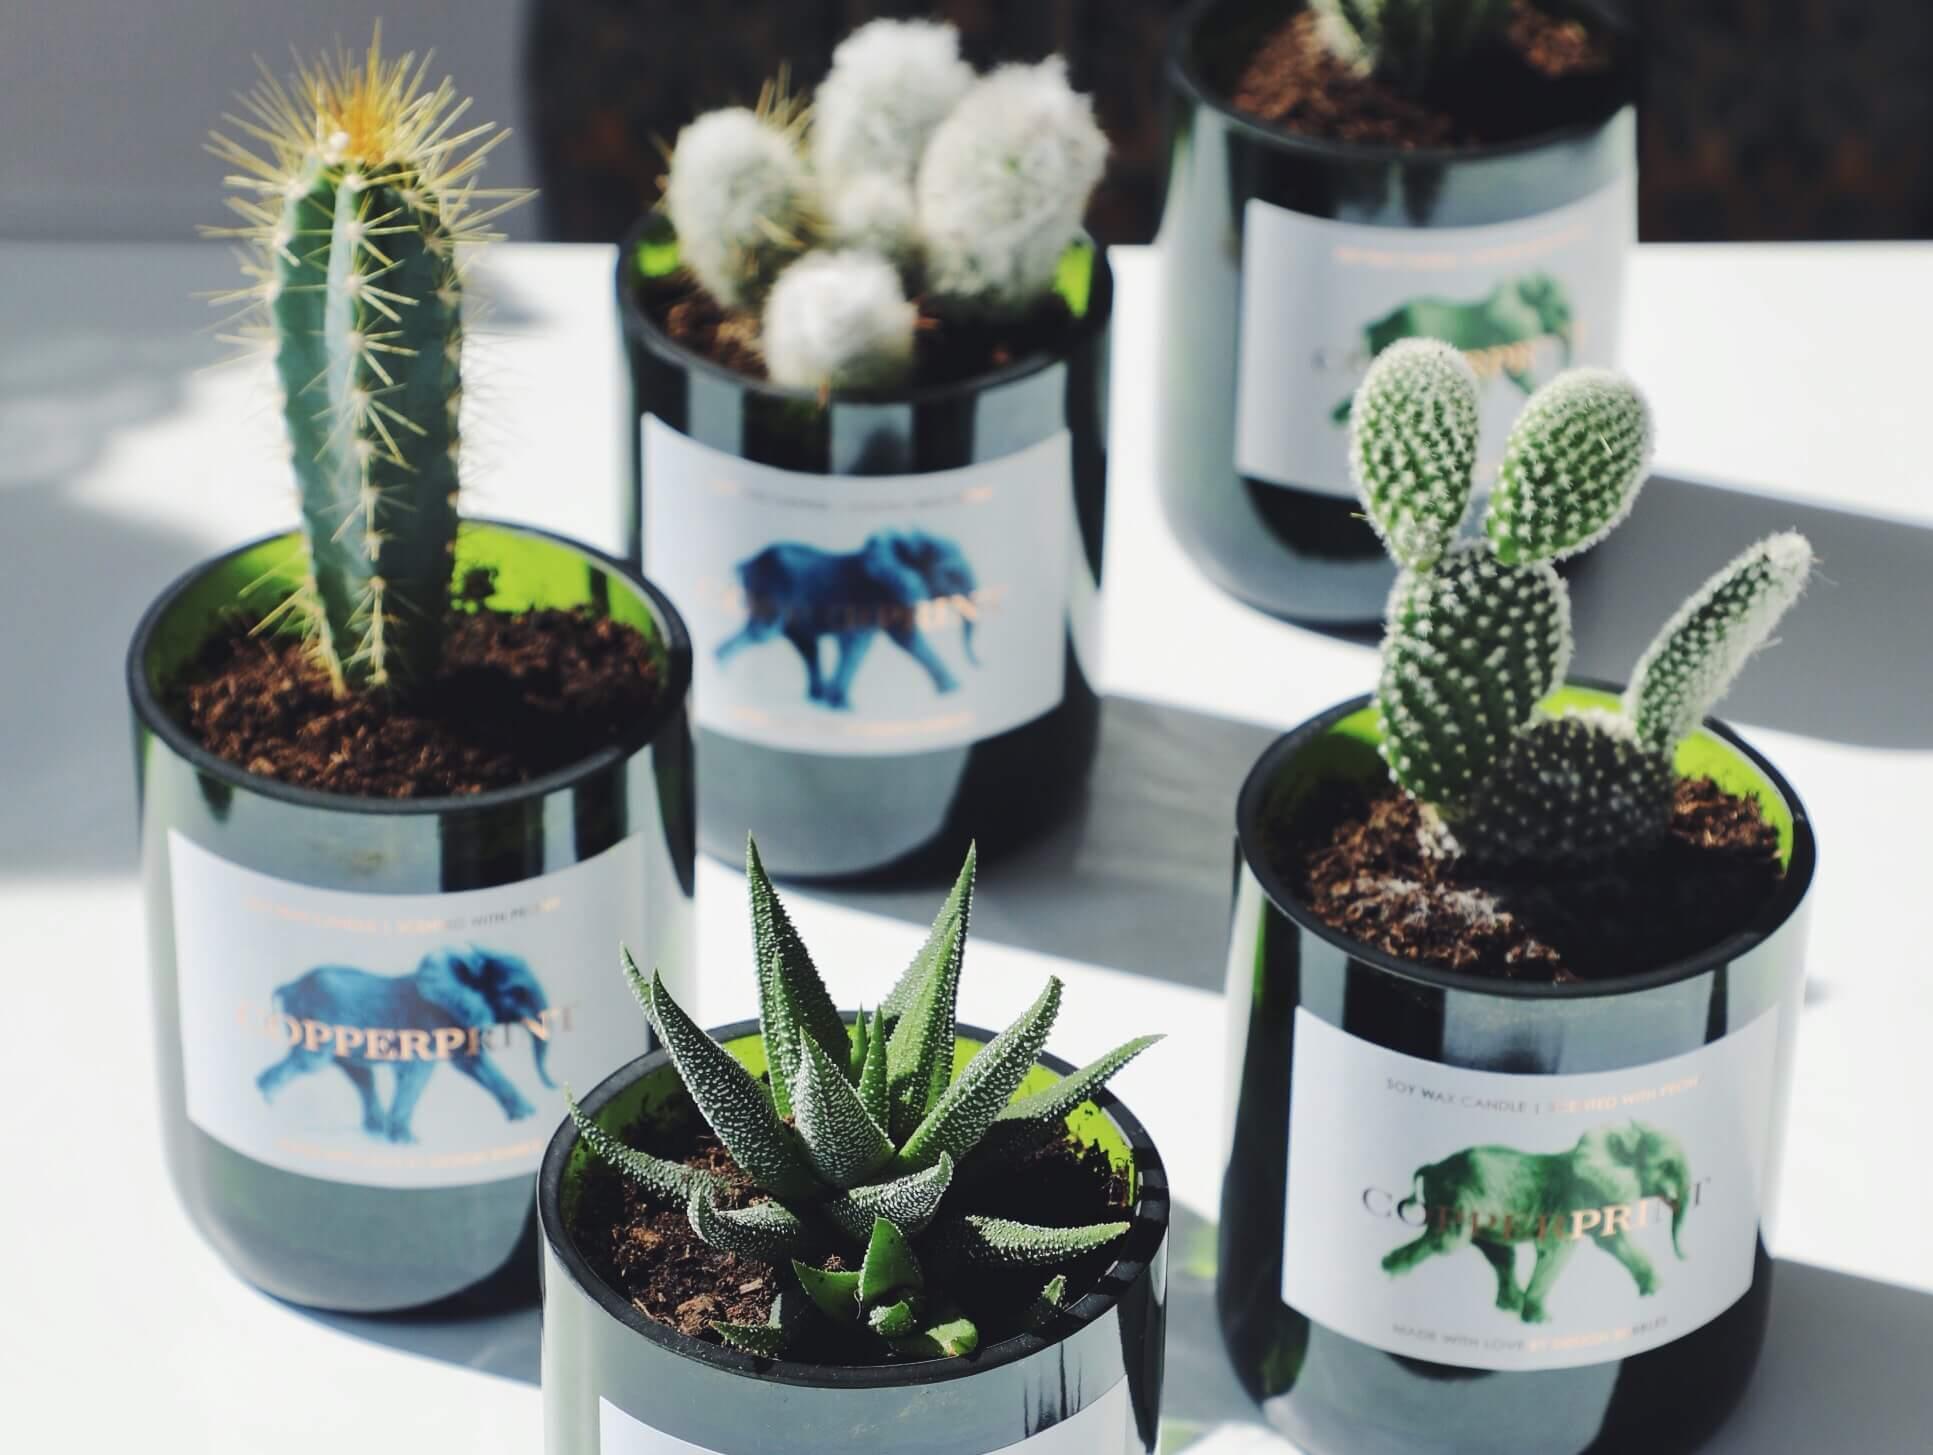 design bubbles beauty greenery sukkulenten kakteen mini nachhaltige interior trends